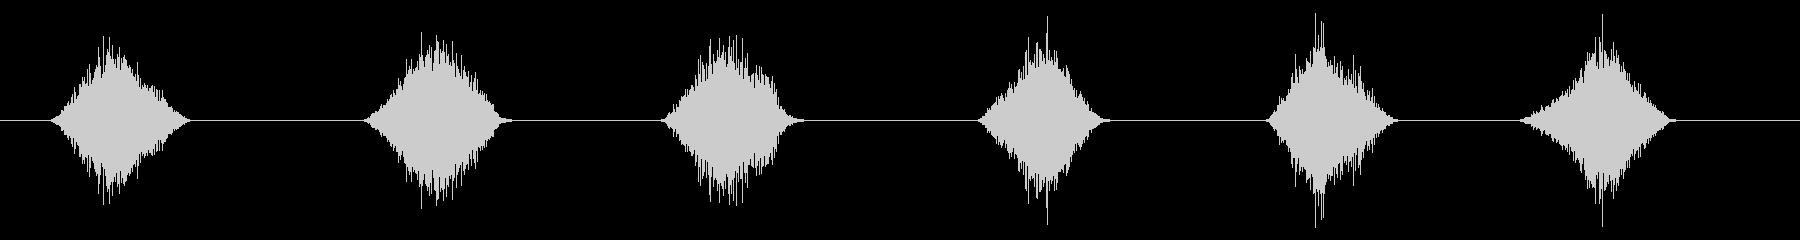 PC マウス ムーブ04-11(ソフト)の未再生の波形